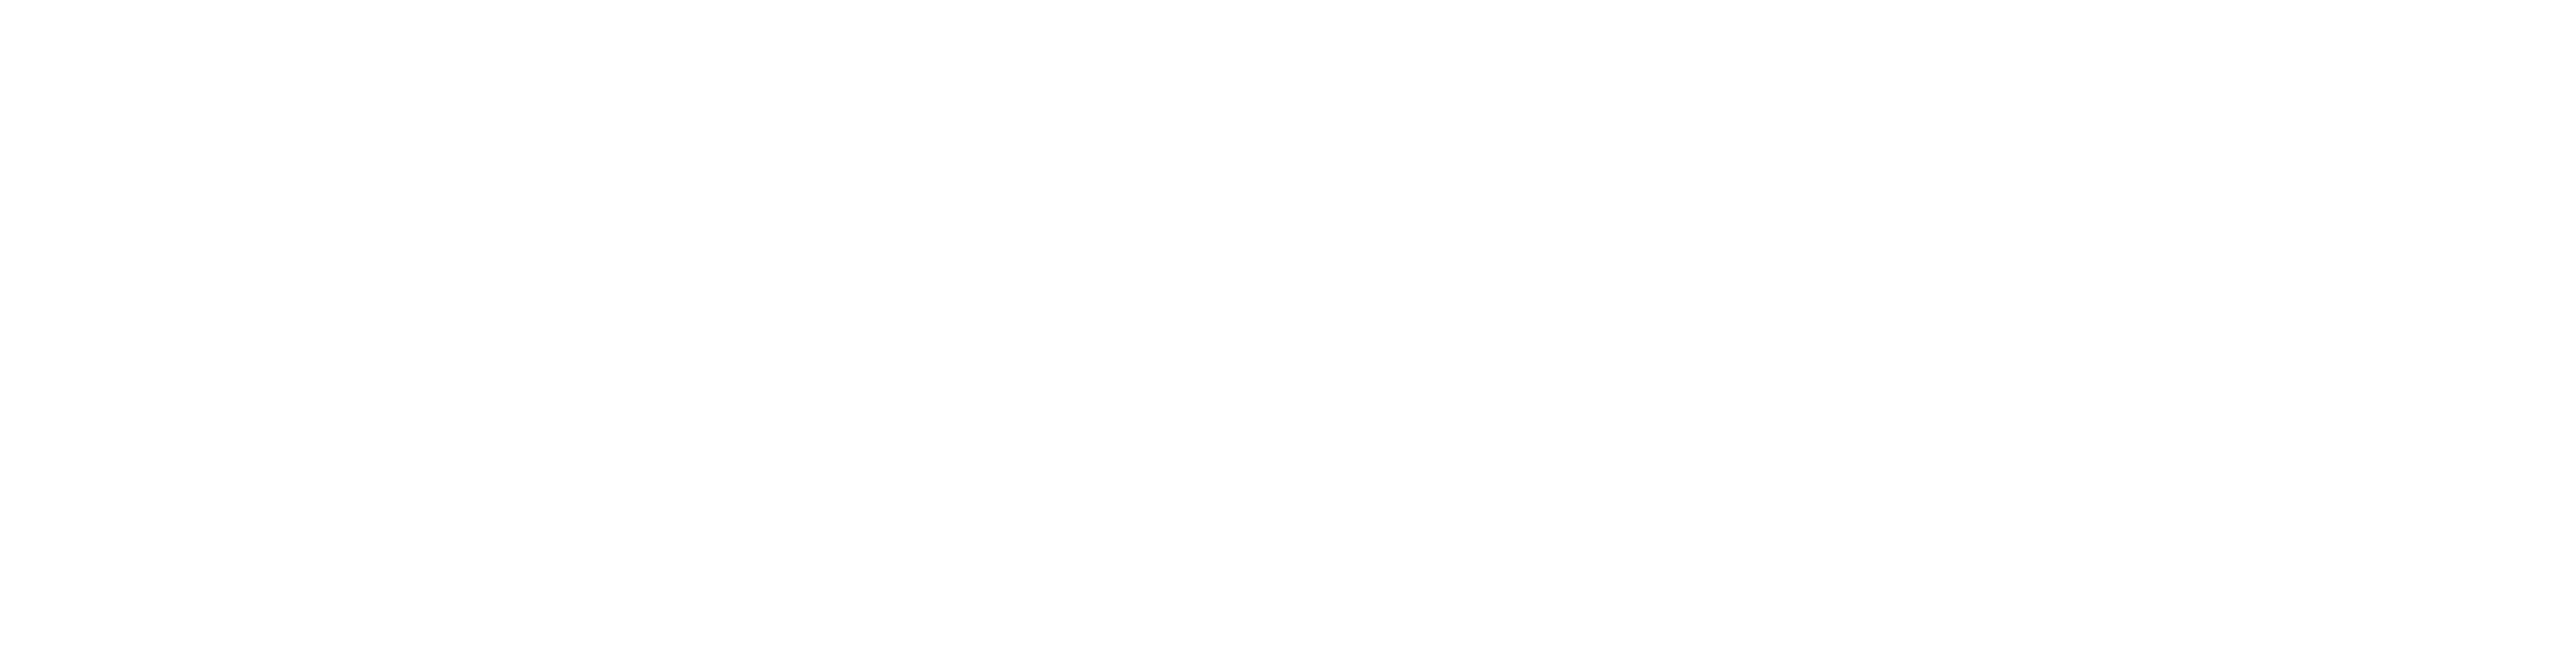 Abbson | Transforming media, yielding amazing results